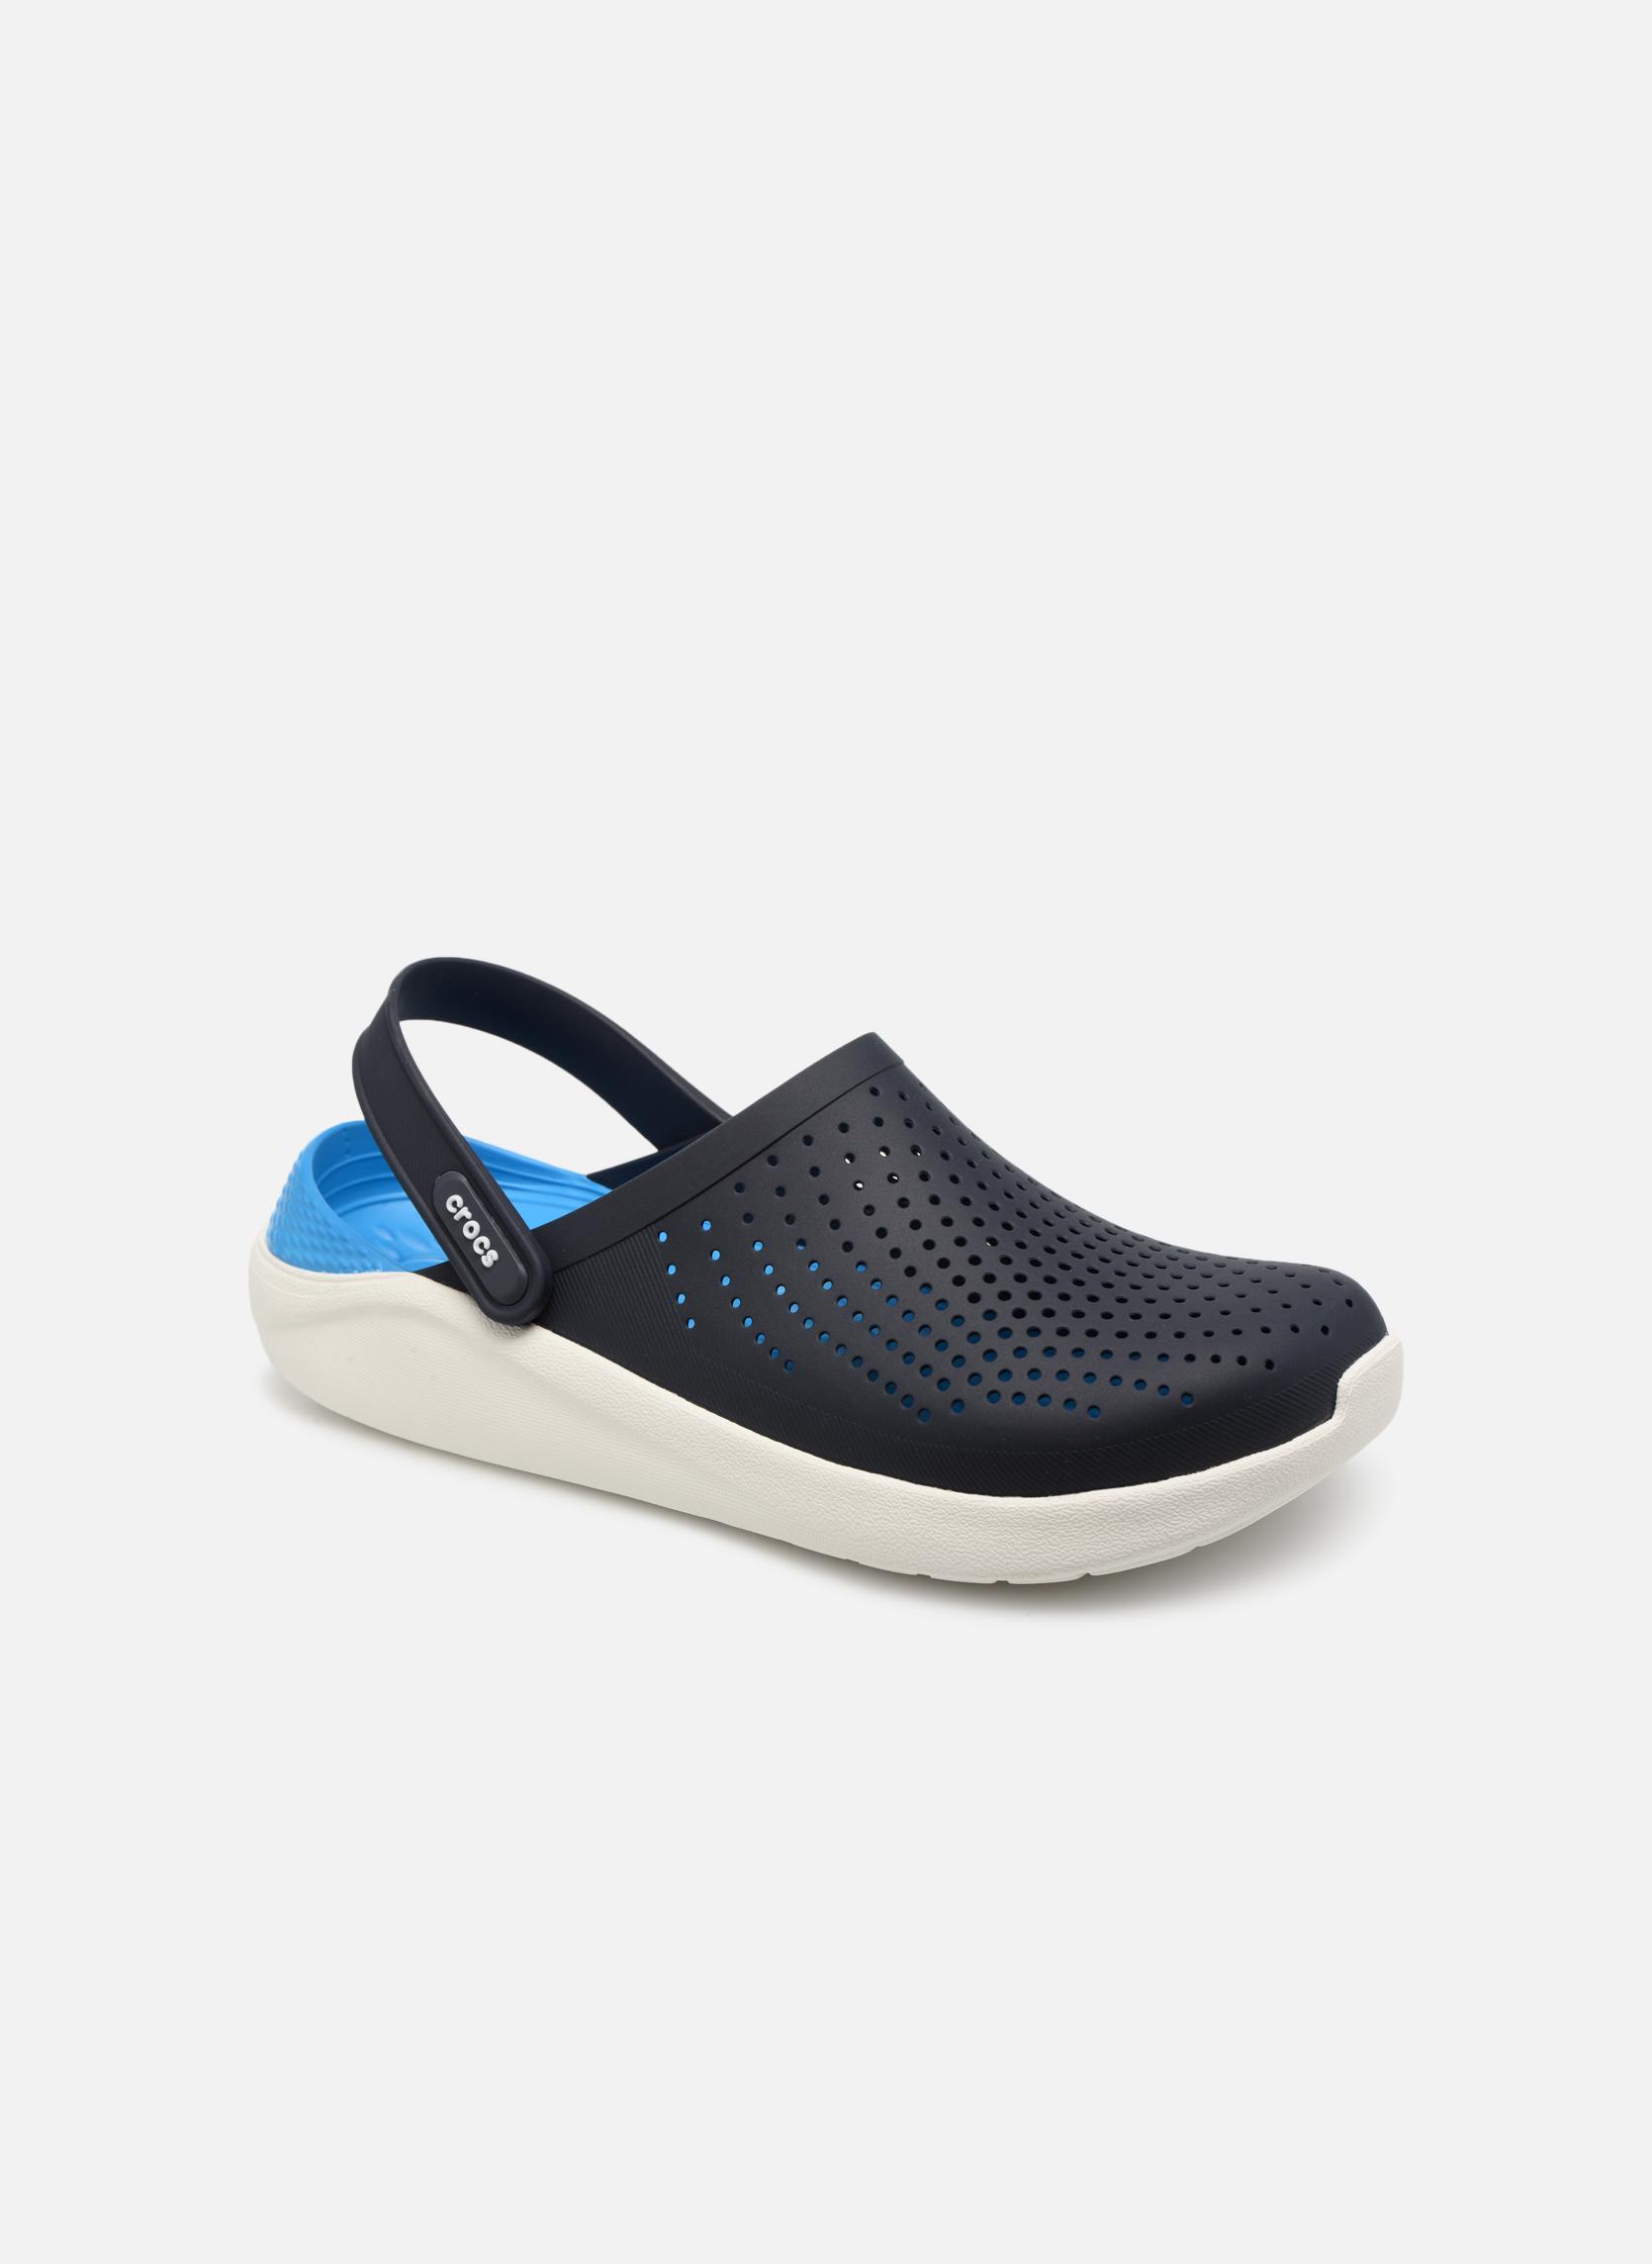 Crocs LiteRide Clog es M (blau) -Gutes Preis-Leistungs-Verhältnis, es Clog lohnt sich,Boutique-3110 e25a0d